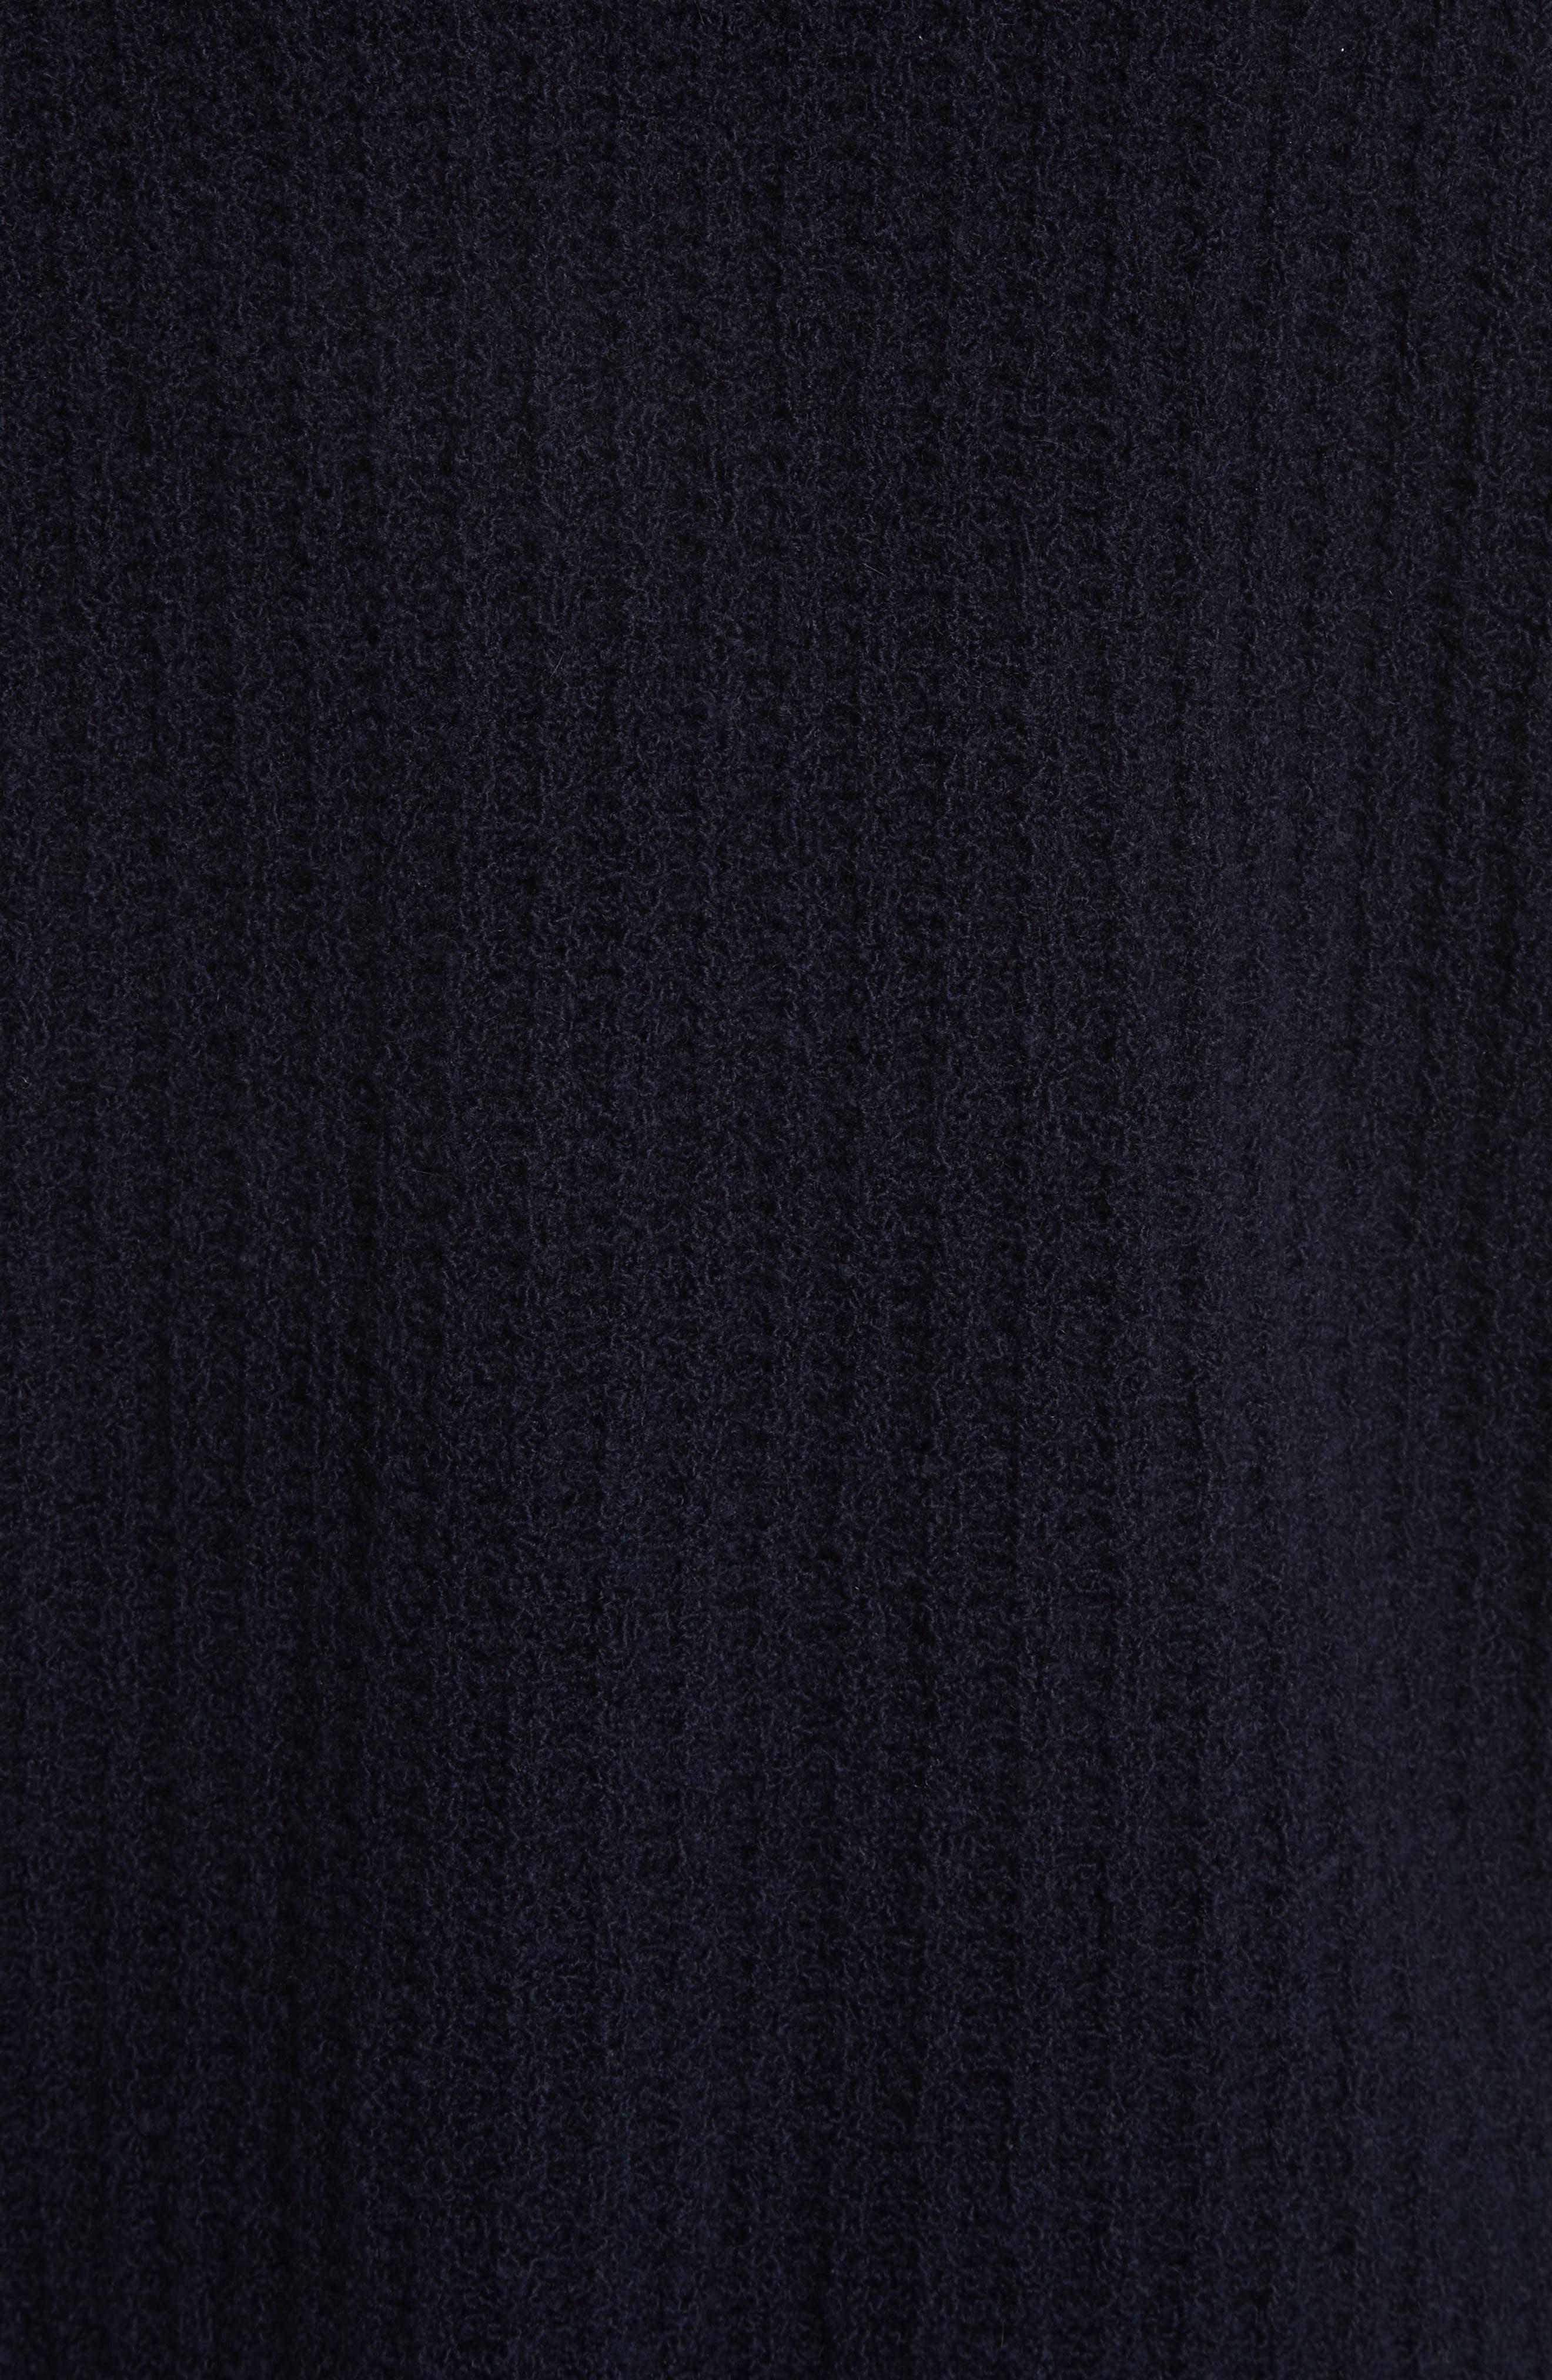 Deep V-Neck Cashmere Blend Sweater,                             Alternate thumbnail 15, color,